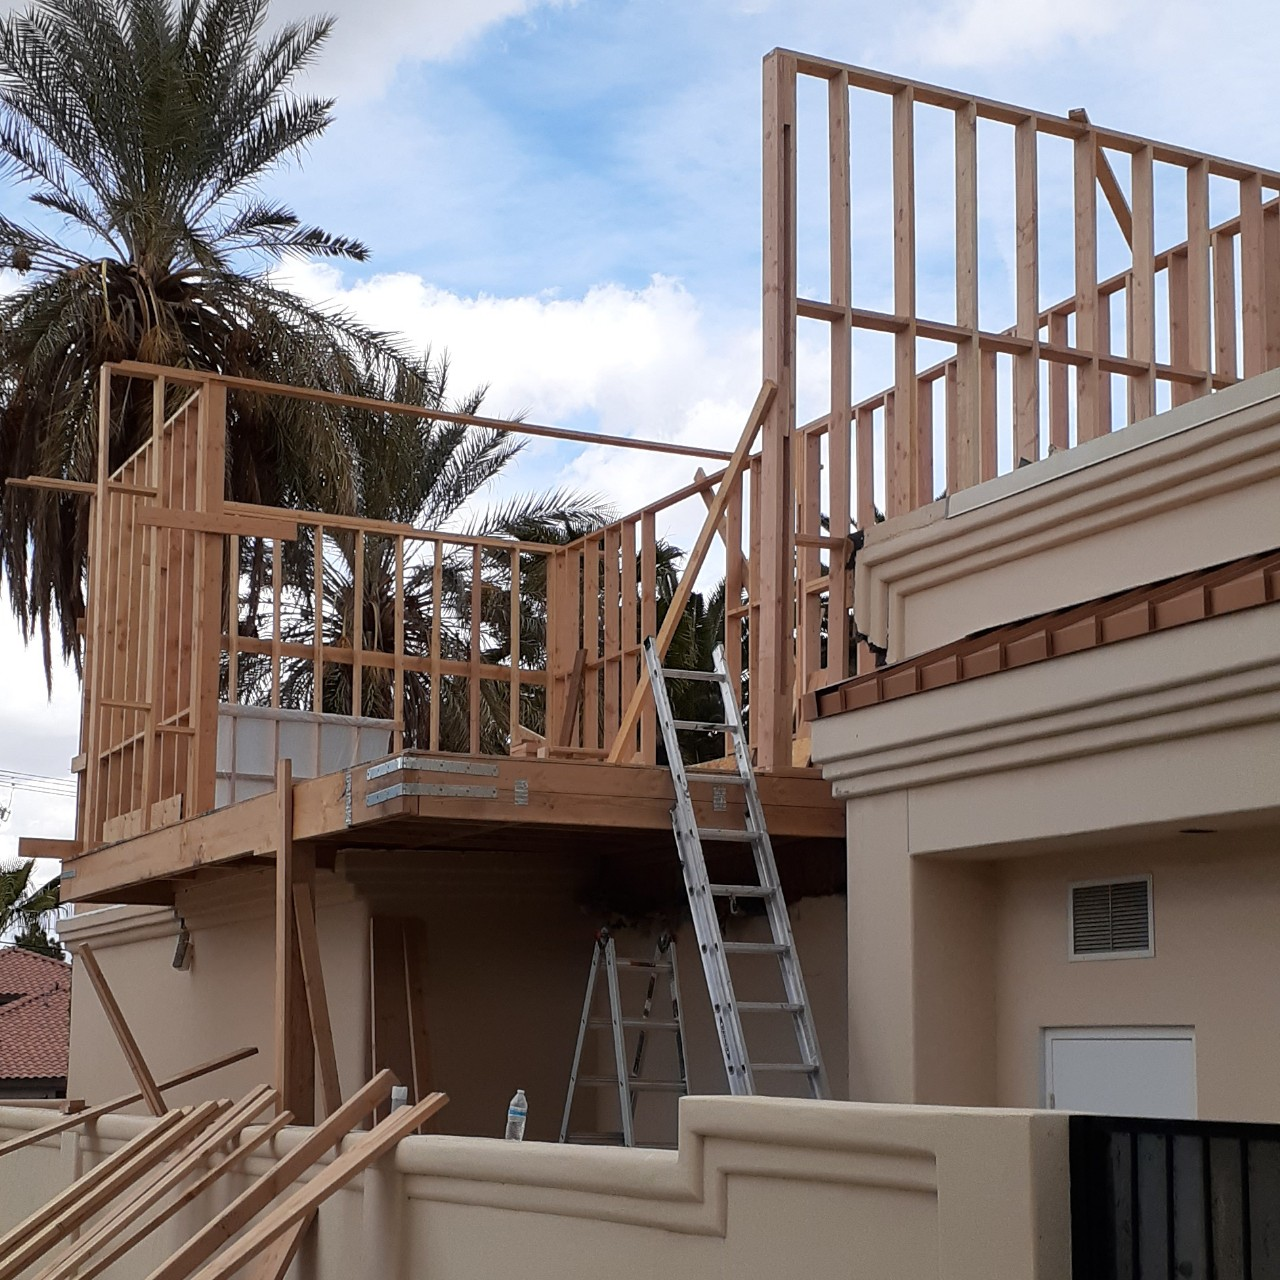 carpentry-wood-framing-second-floor-home-addition--framing-84